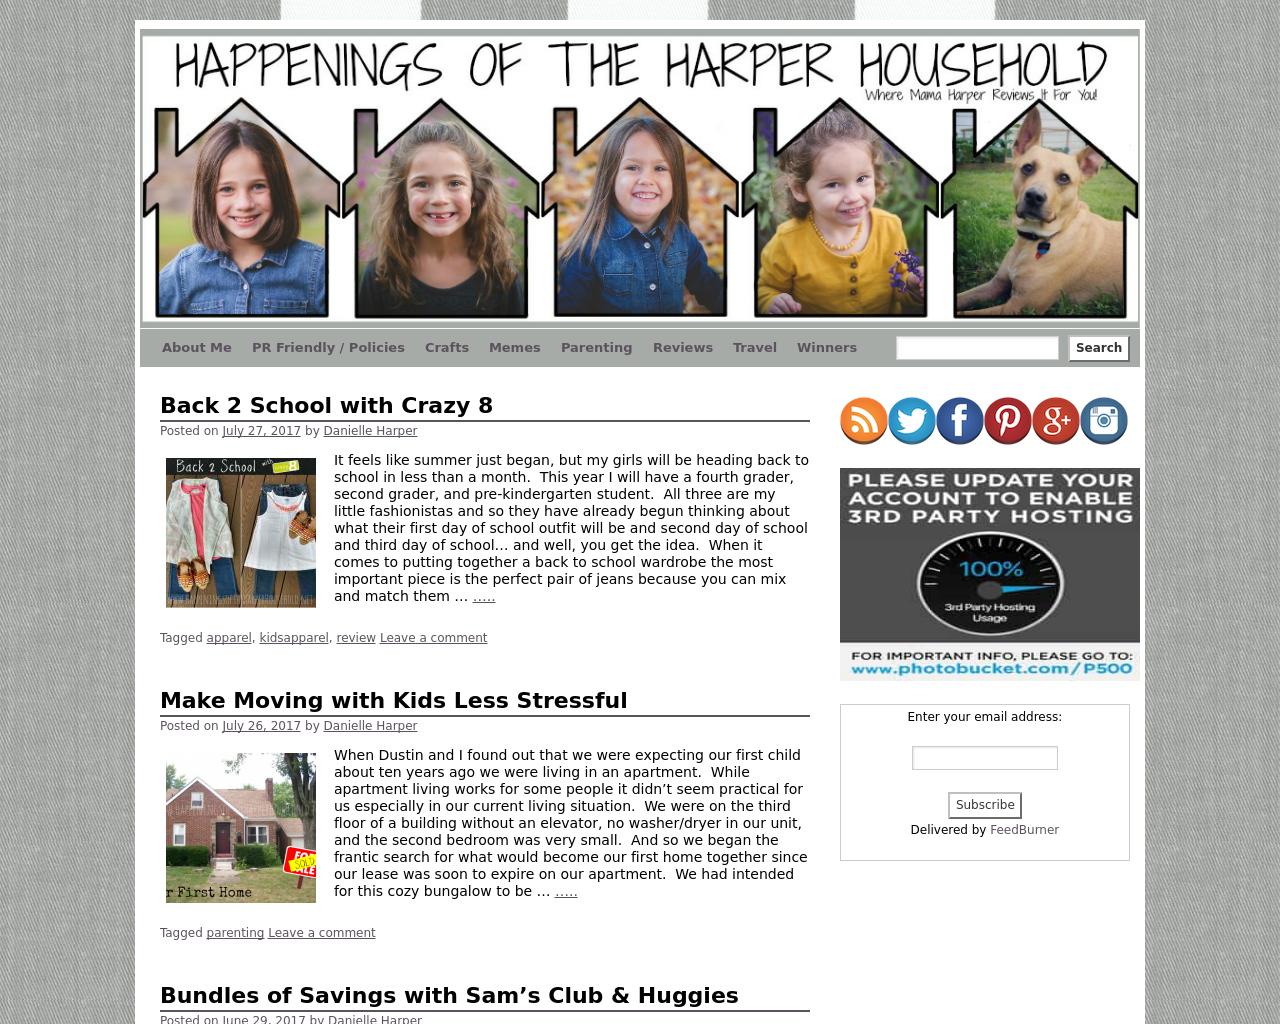 Happenings-Of-The-Harper-Household-Advertising-Reviews-Pricing